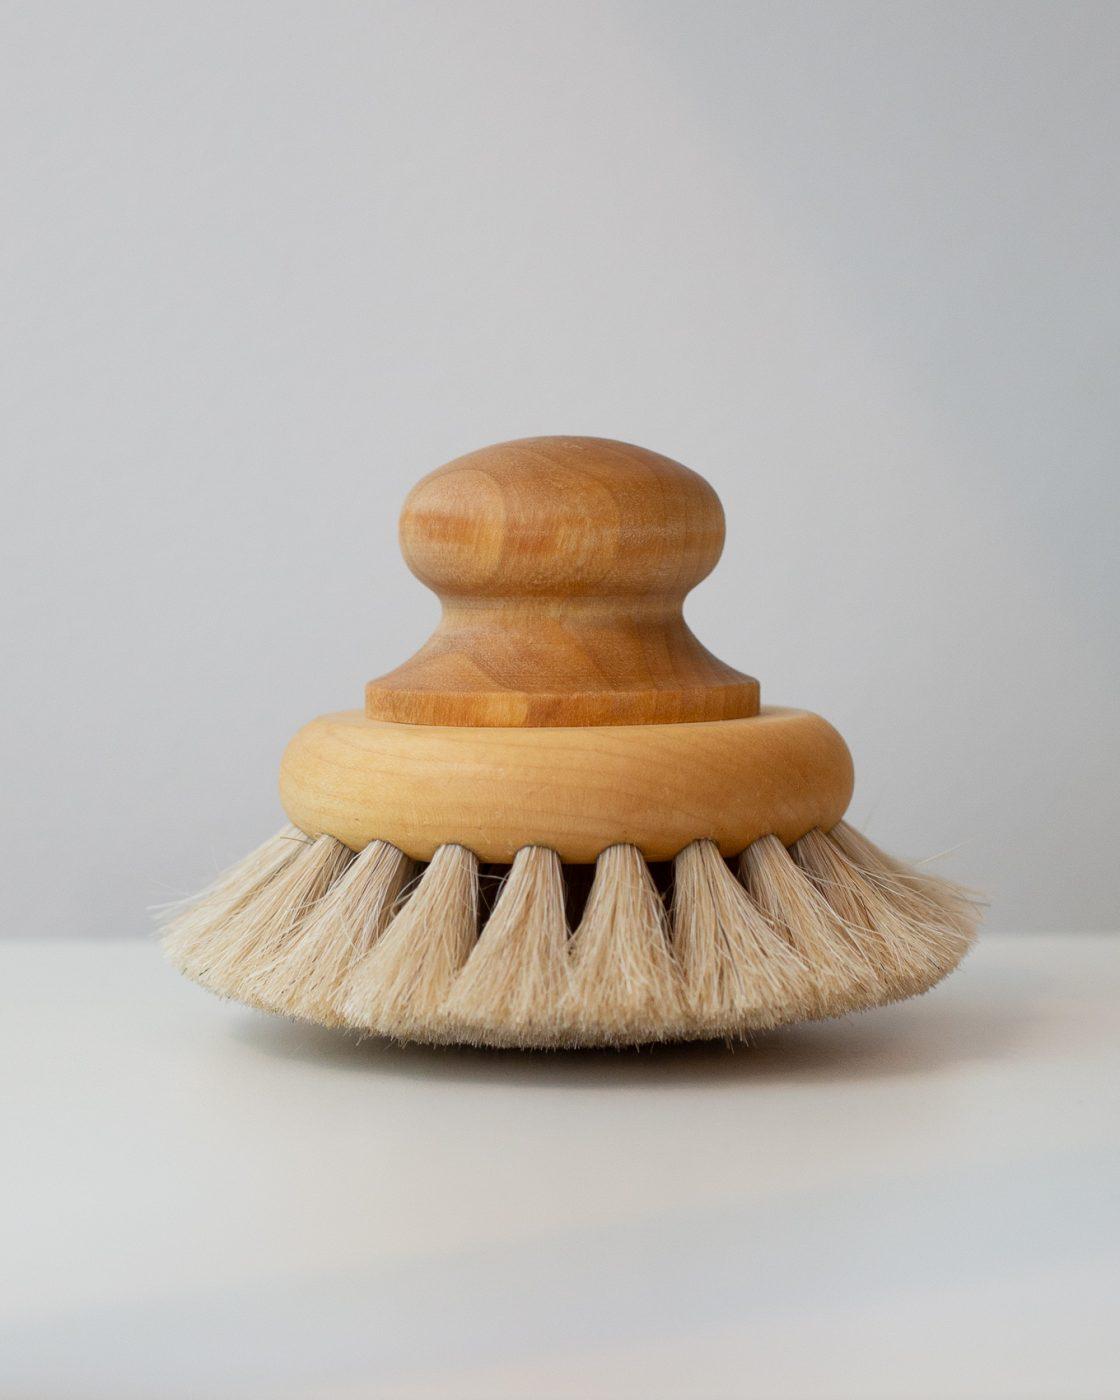 Dry Brush with Knob